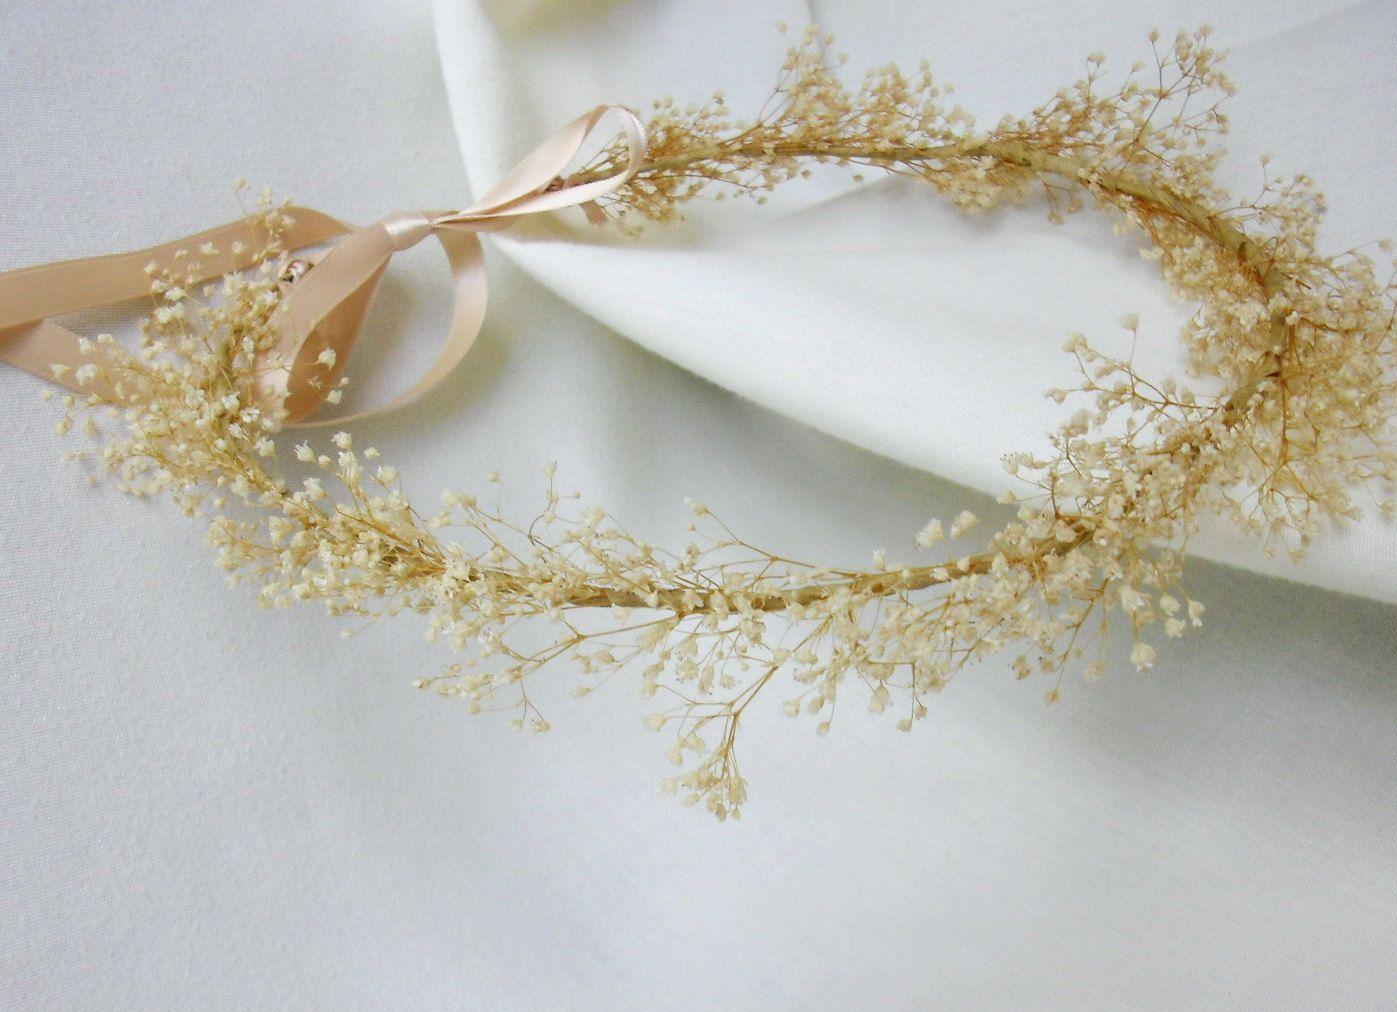 Bridal hair accessories babys breath - Beach Wedding Bridal Floral Headband Hair Wreath Babys Breath Ivory Flower Hair Accessory Head Wreath Circlet